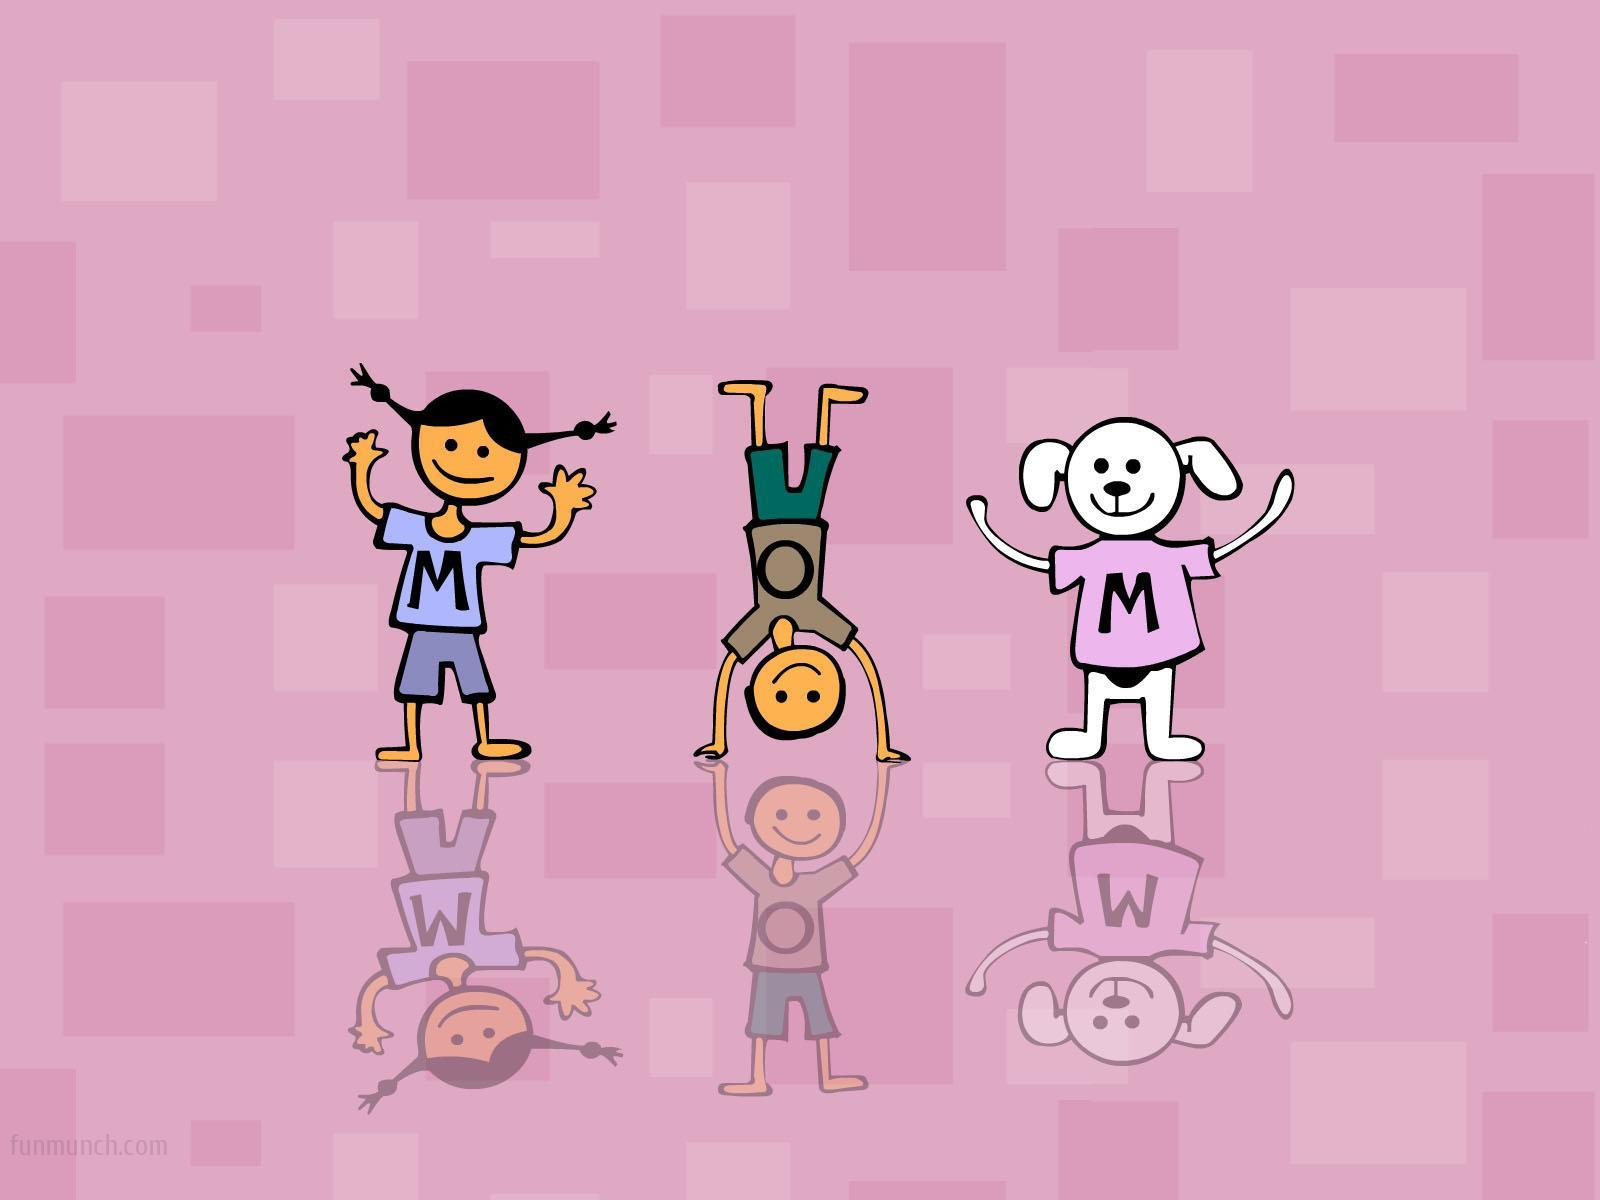 http://4.bp.blogspot.com/-HoYsG77sZP0/T5j9Y72P9wI/AAAAAAAADdU/DM4ugRdT3AA/s1600/Mom-Mothers-Day-Cartoon-Wallpaper.jpeg